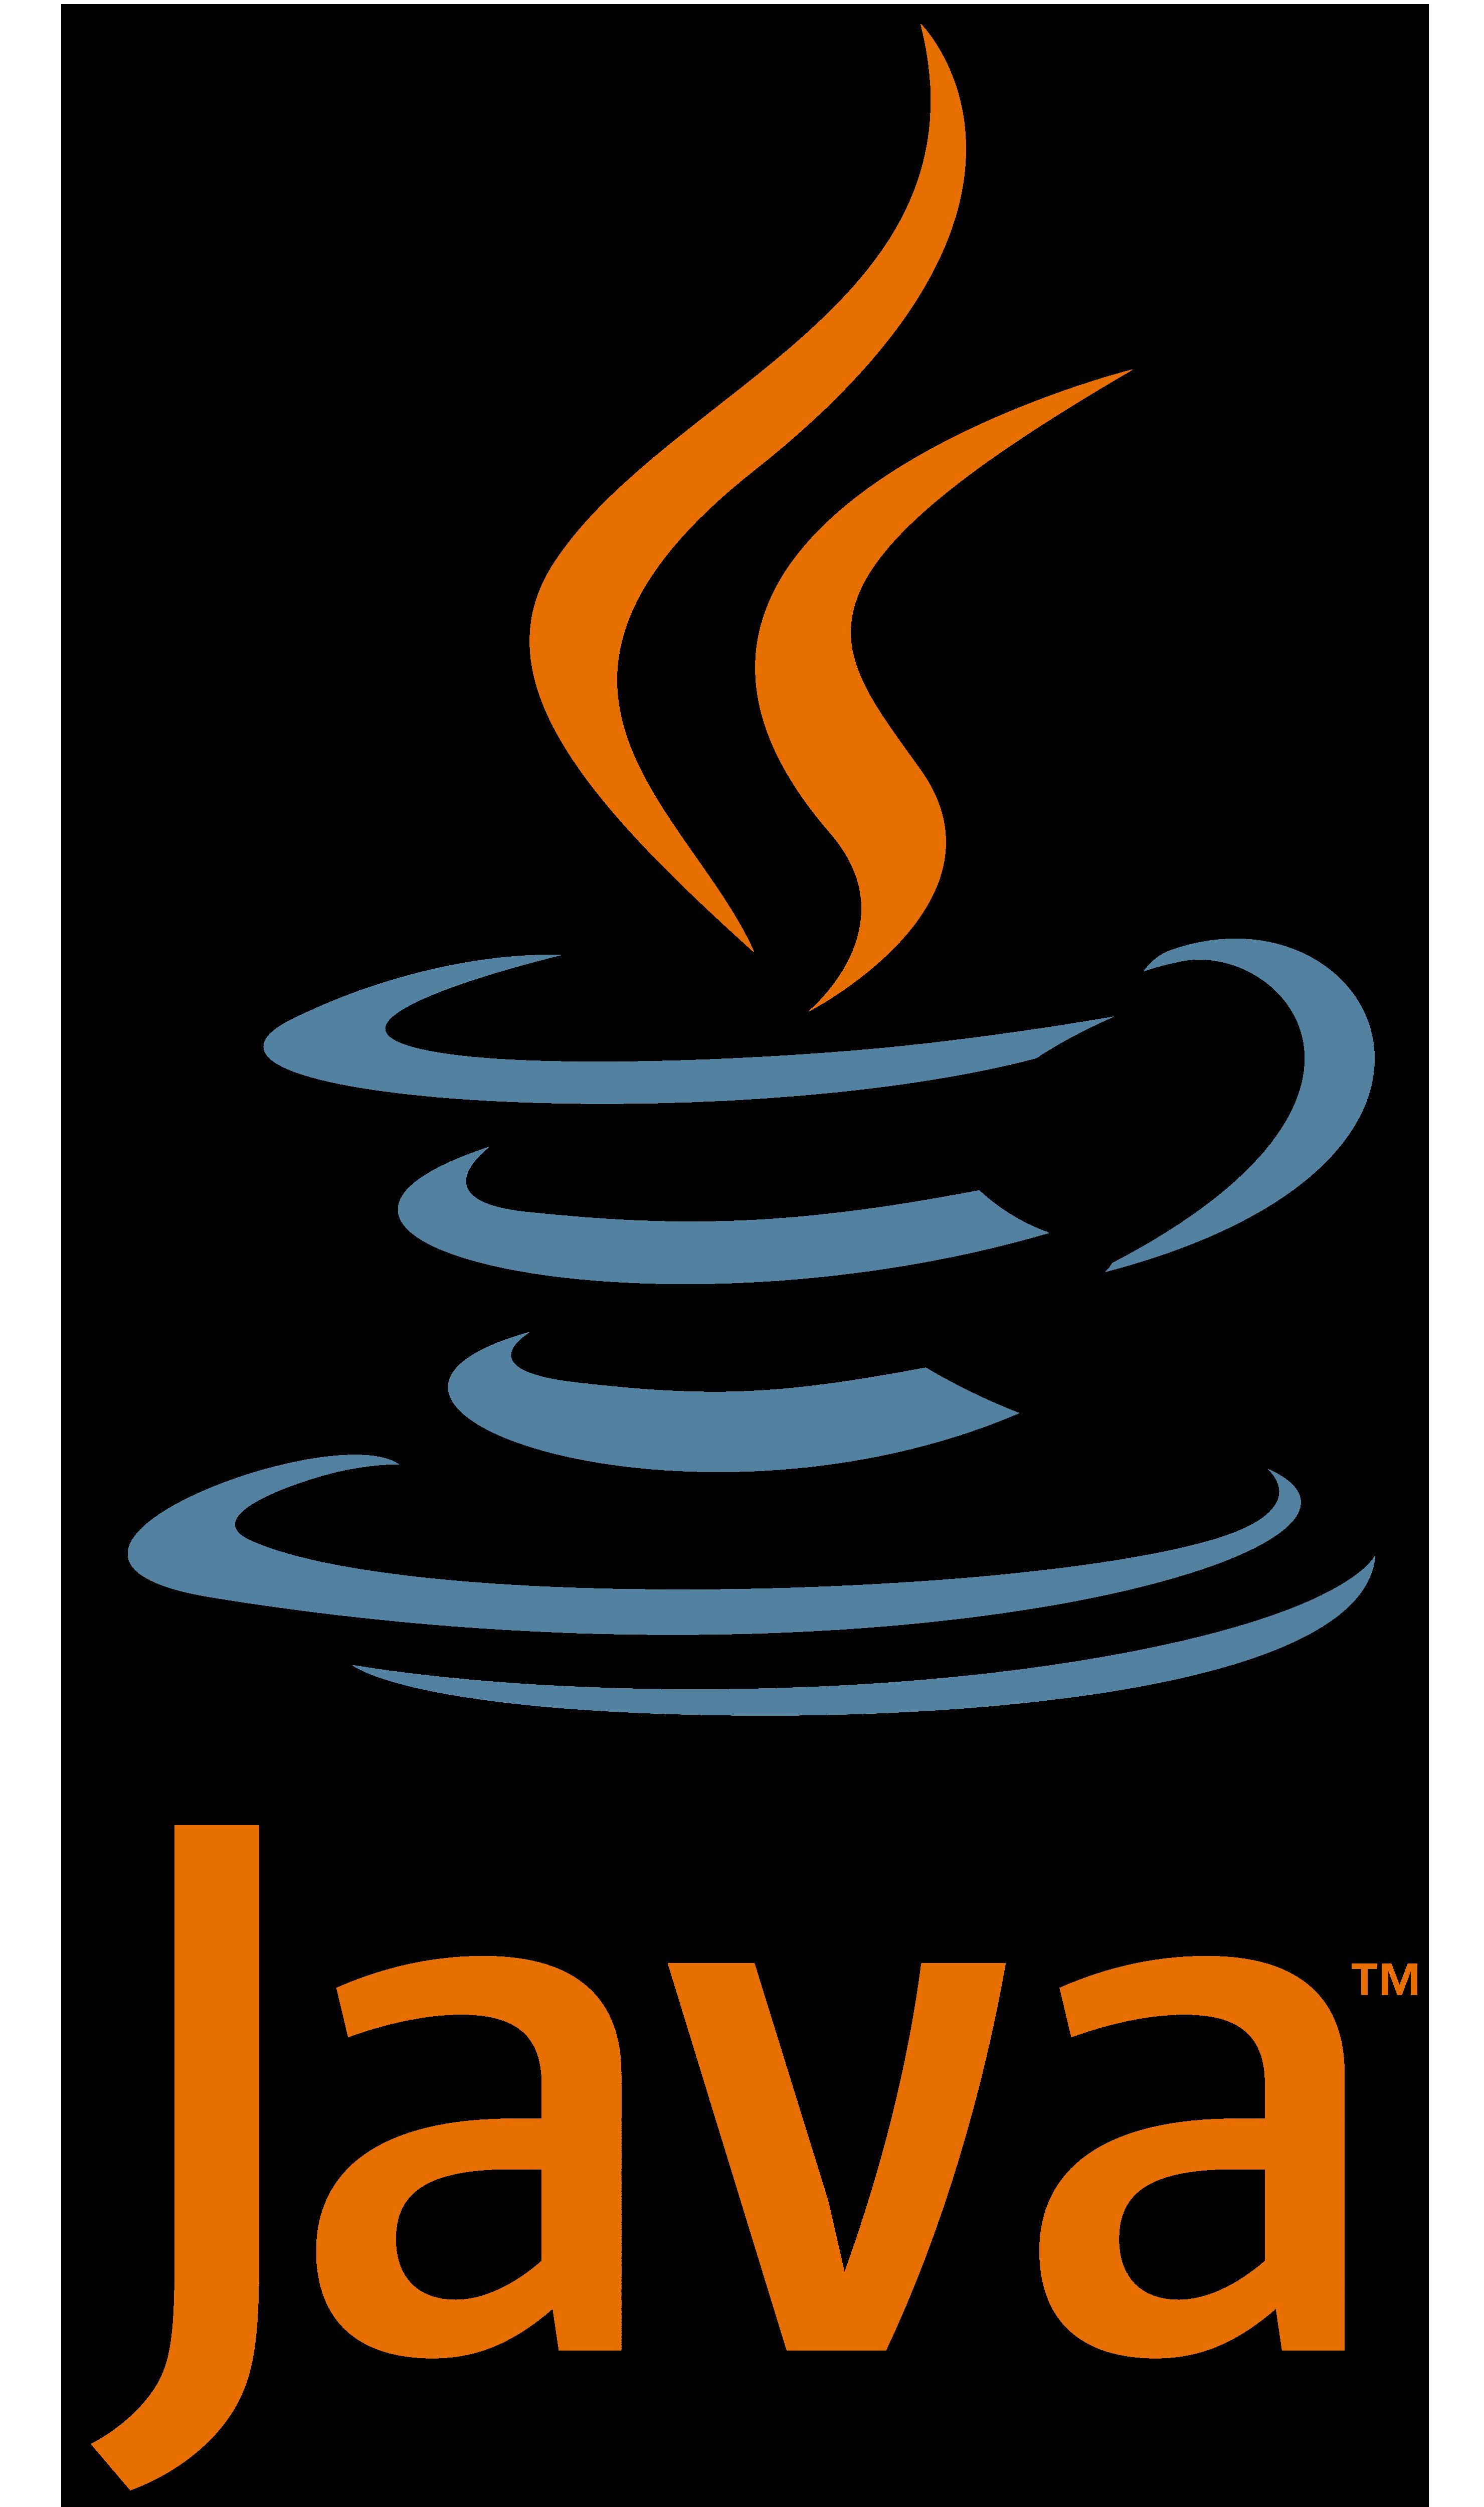 Java – Logos Download Java Download